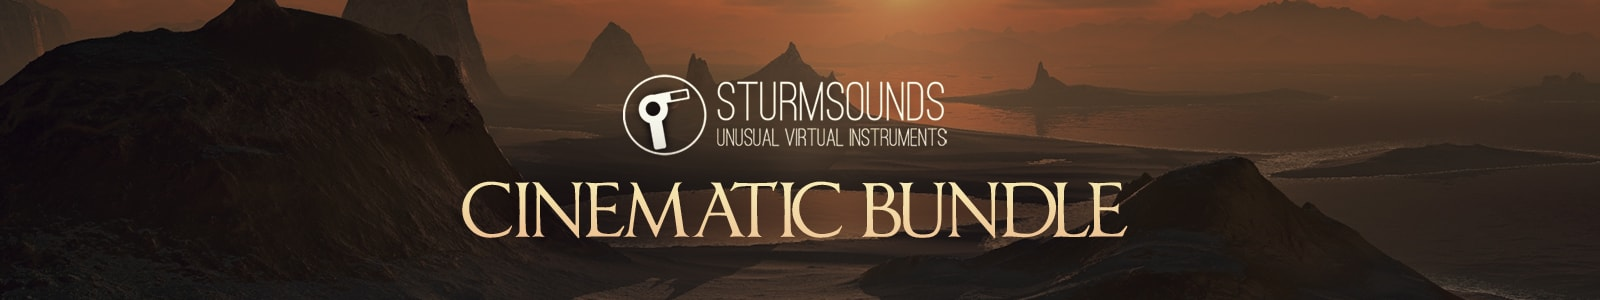 sturmsounds cinematic bundle